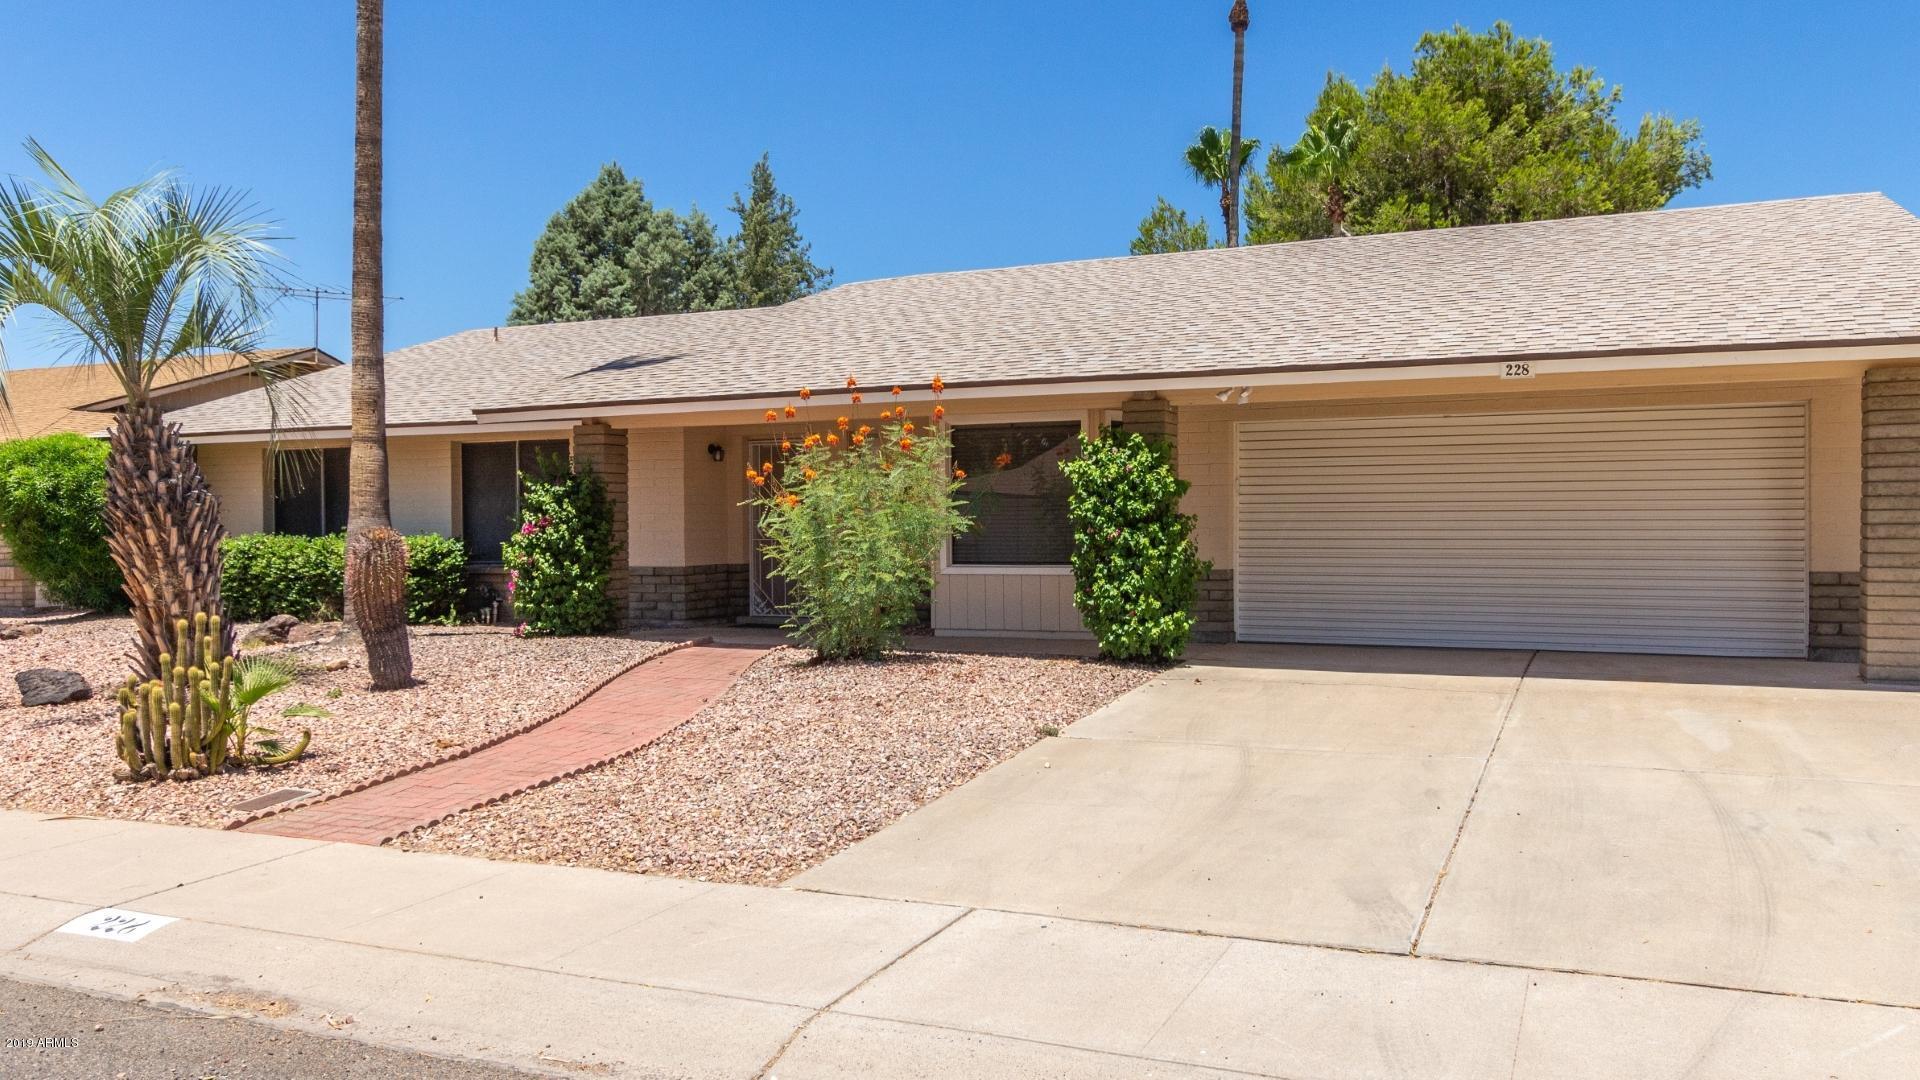 228 E ANGELA Drive, Phoenix North in Maricopa County, AZ 85022 Home for Sale